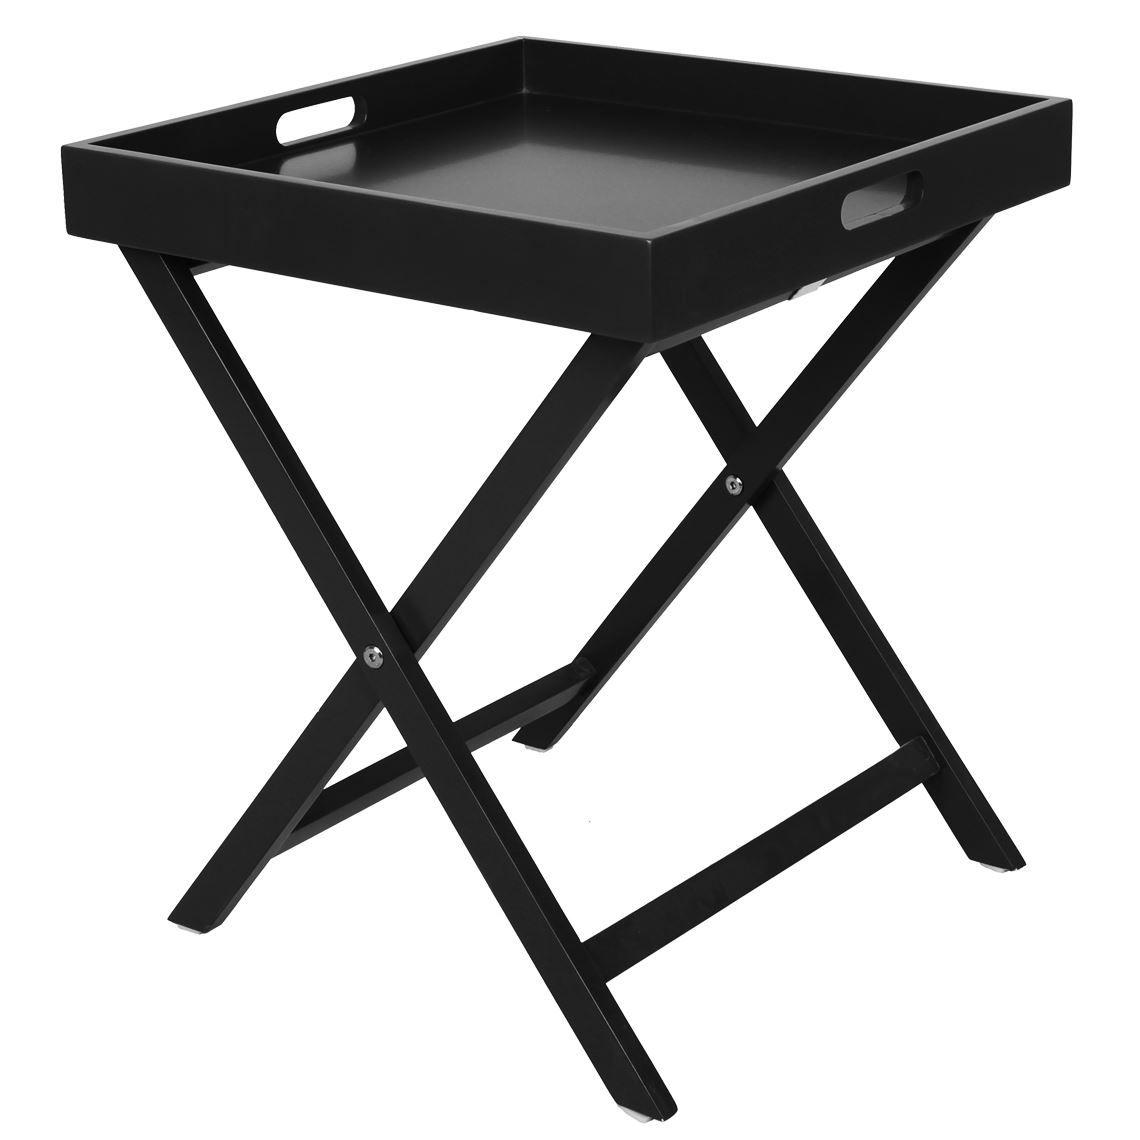 Dante 40x40cm Butler Tray Table Black In 2019 Butlers